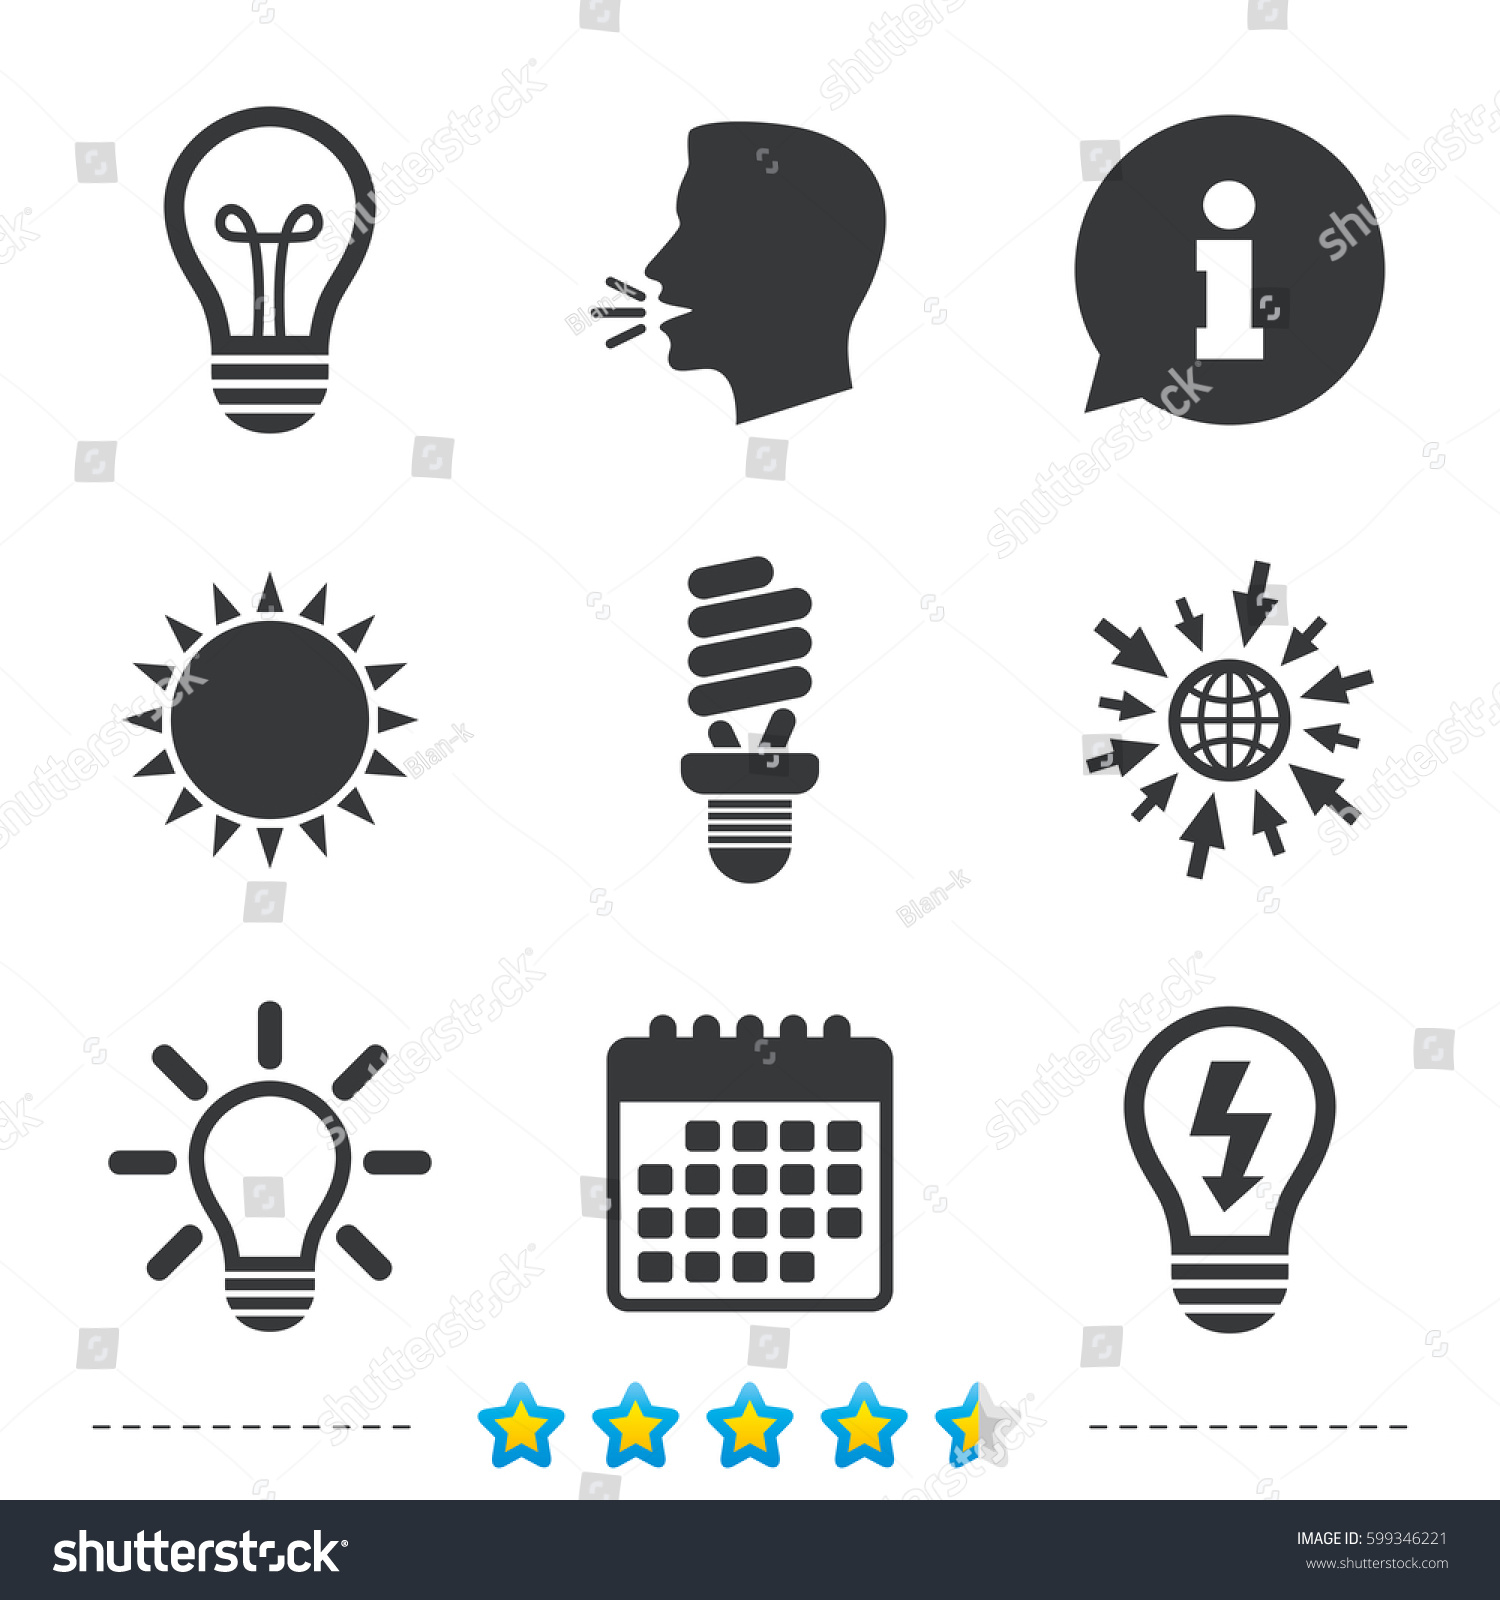 Light Lamp Icons Fluorescent Lamp Bulb Stock Vector 599346221